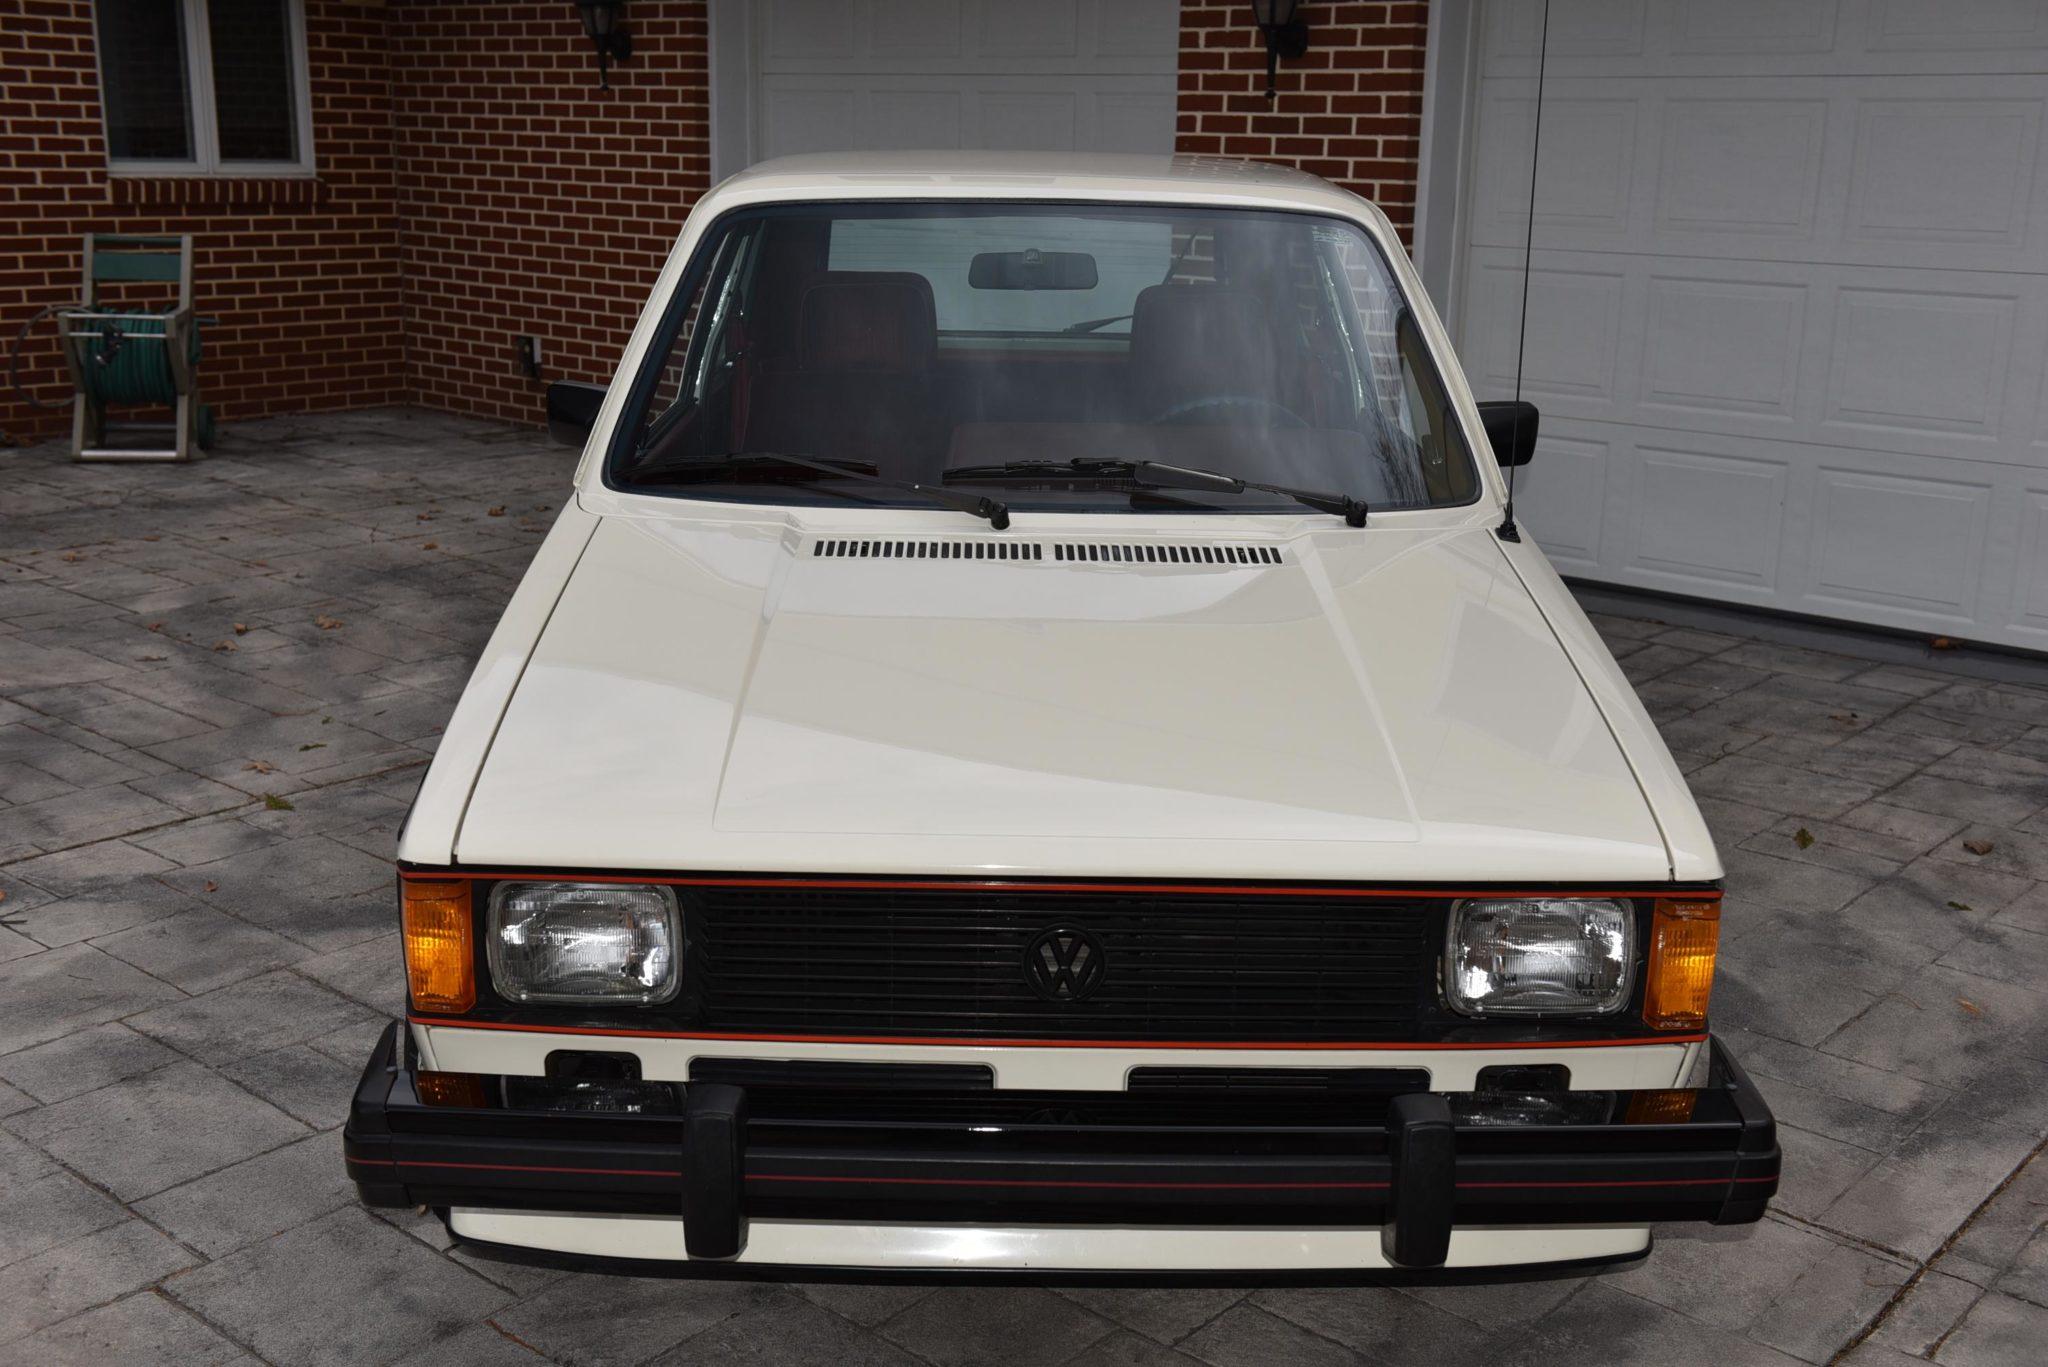 1983_volkswagen_rabbit_gti_15870390879c27f8dLEM_9905-scaled